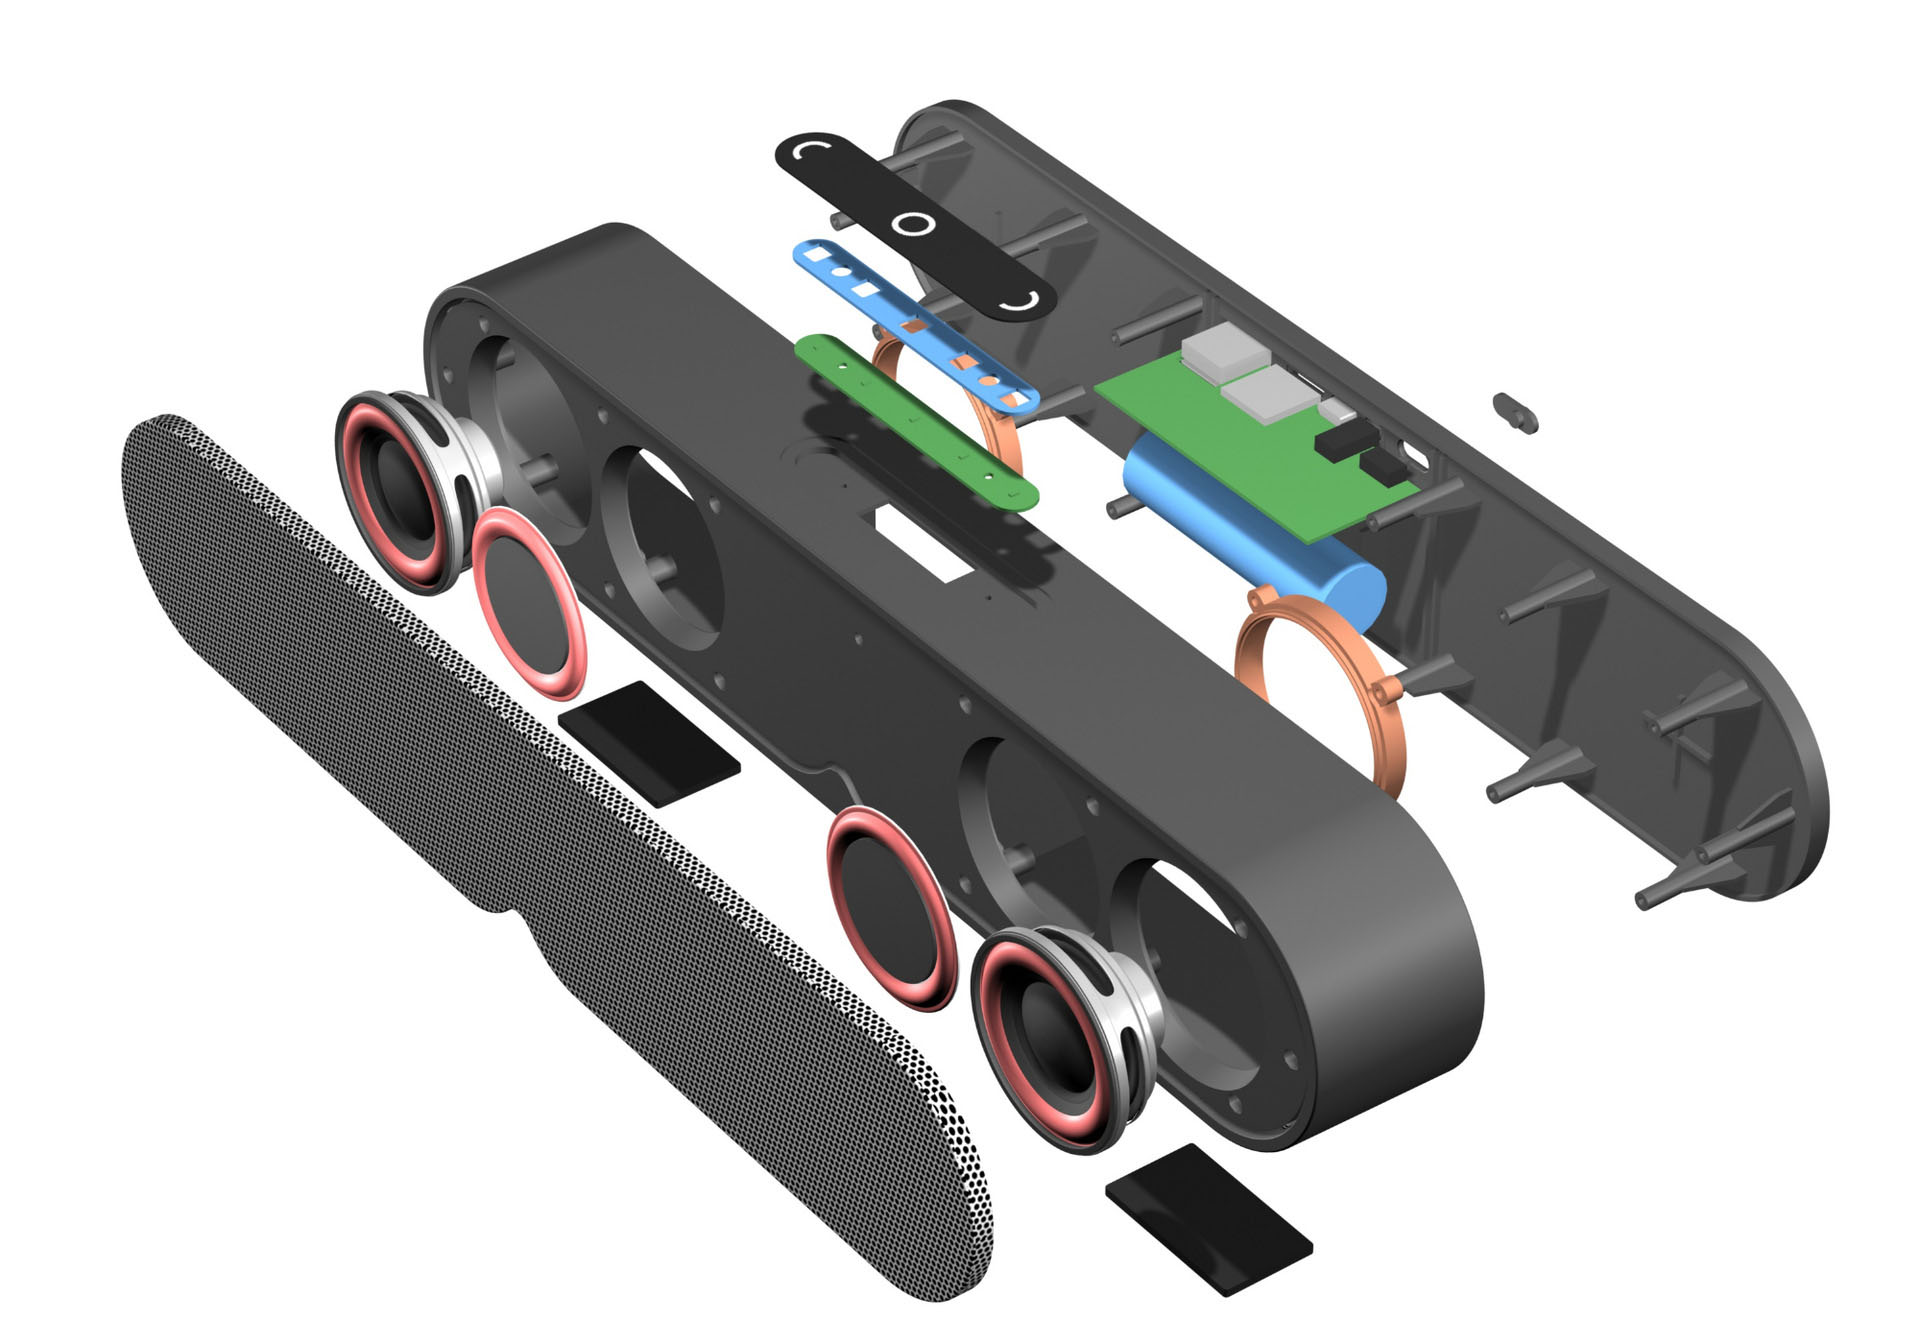 360 surround sound 10W soundbar miniso Bluetooth speaker built-in 2000mah battery